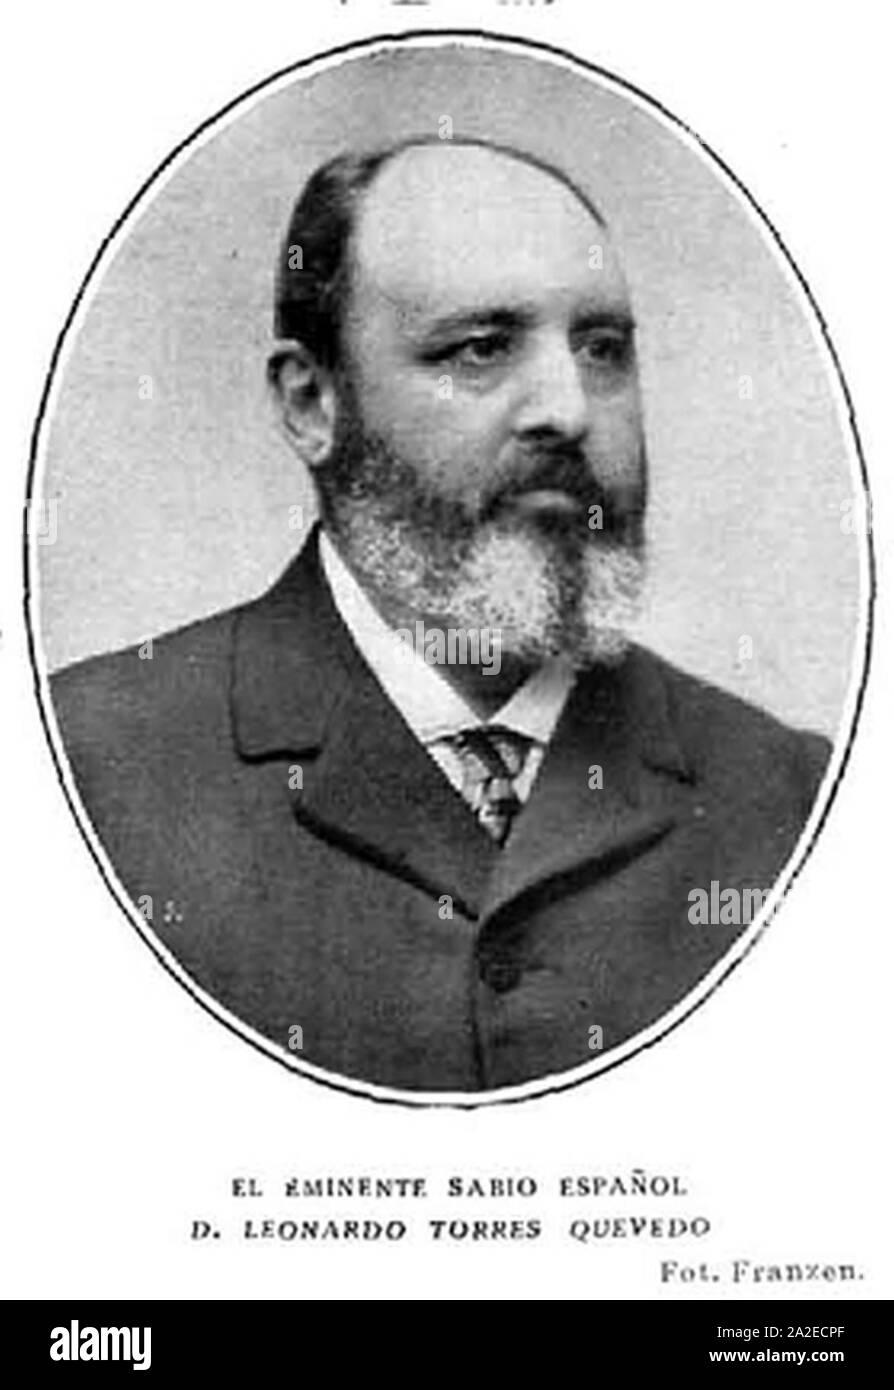 El eminente sabio español Leonardo Torres Quevedo de Franzen. Foto de stock